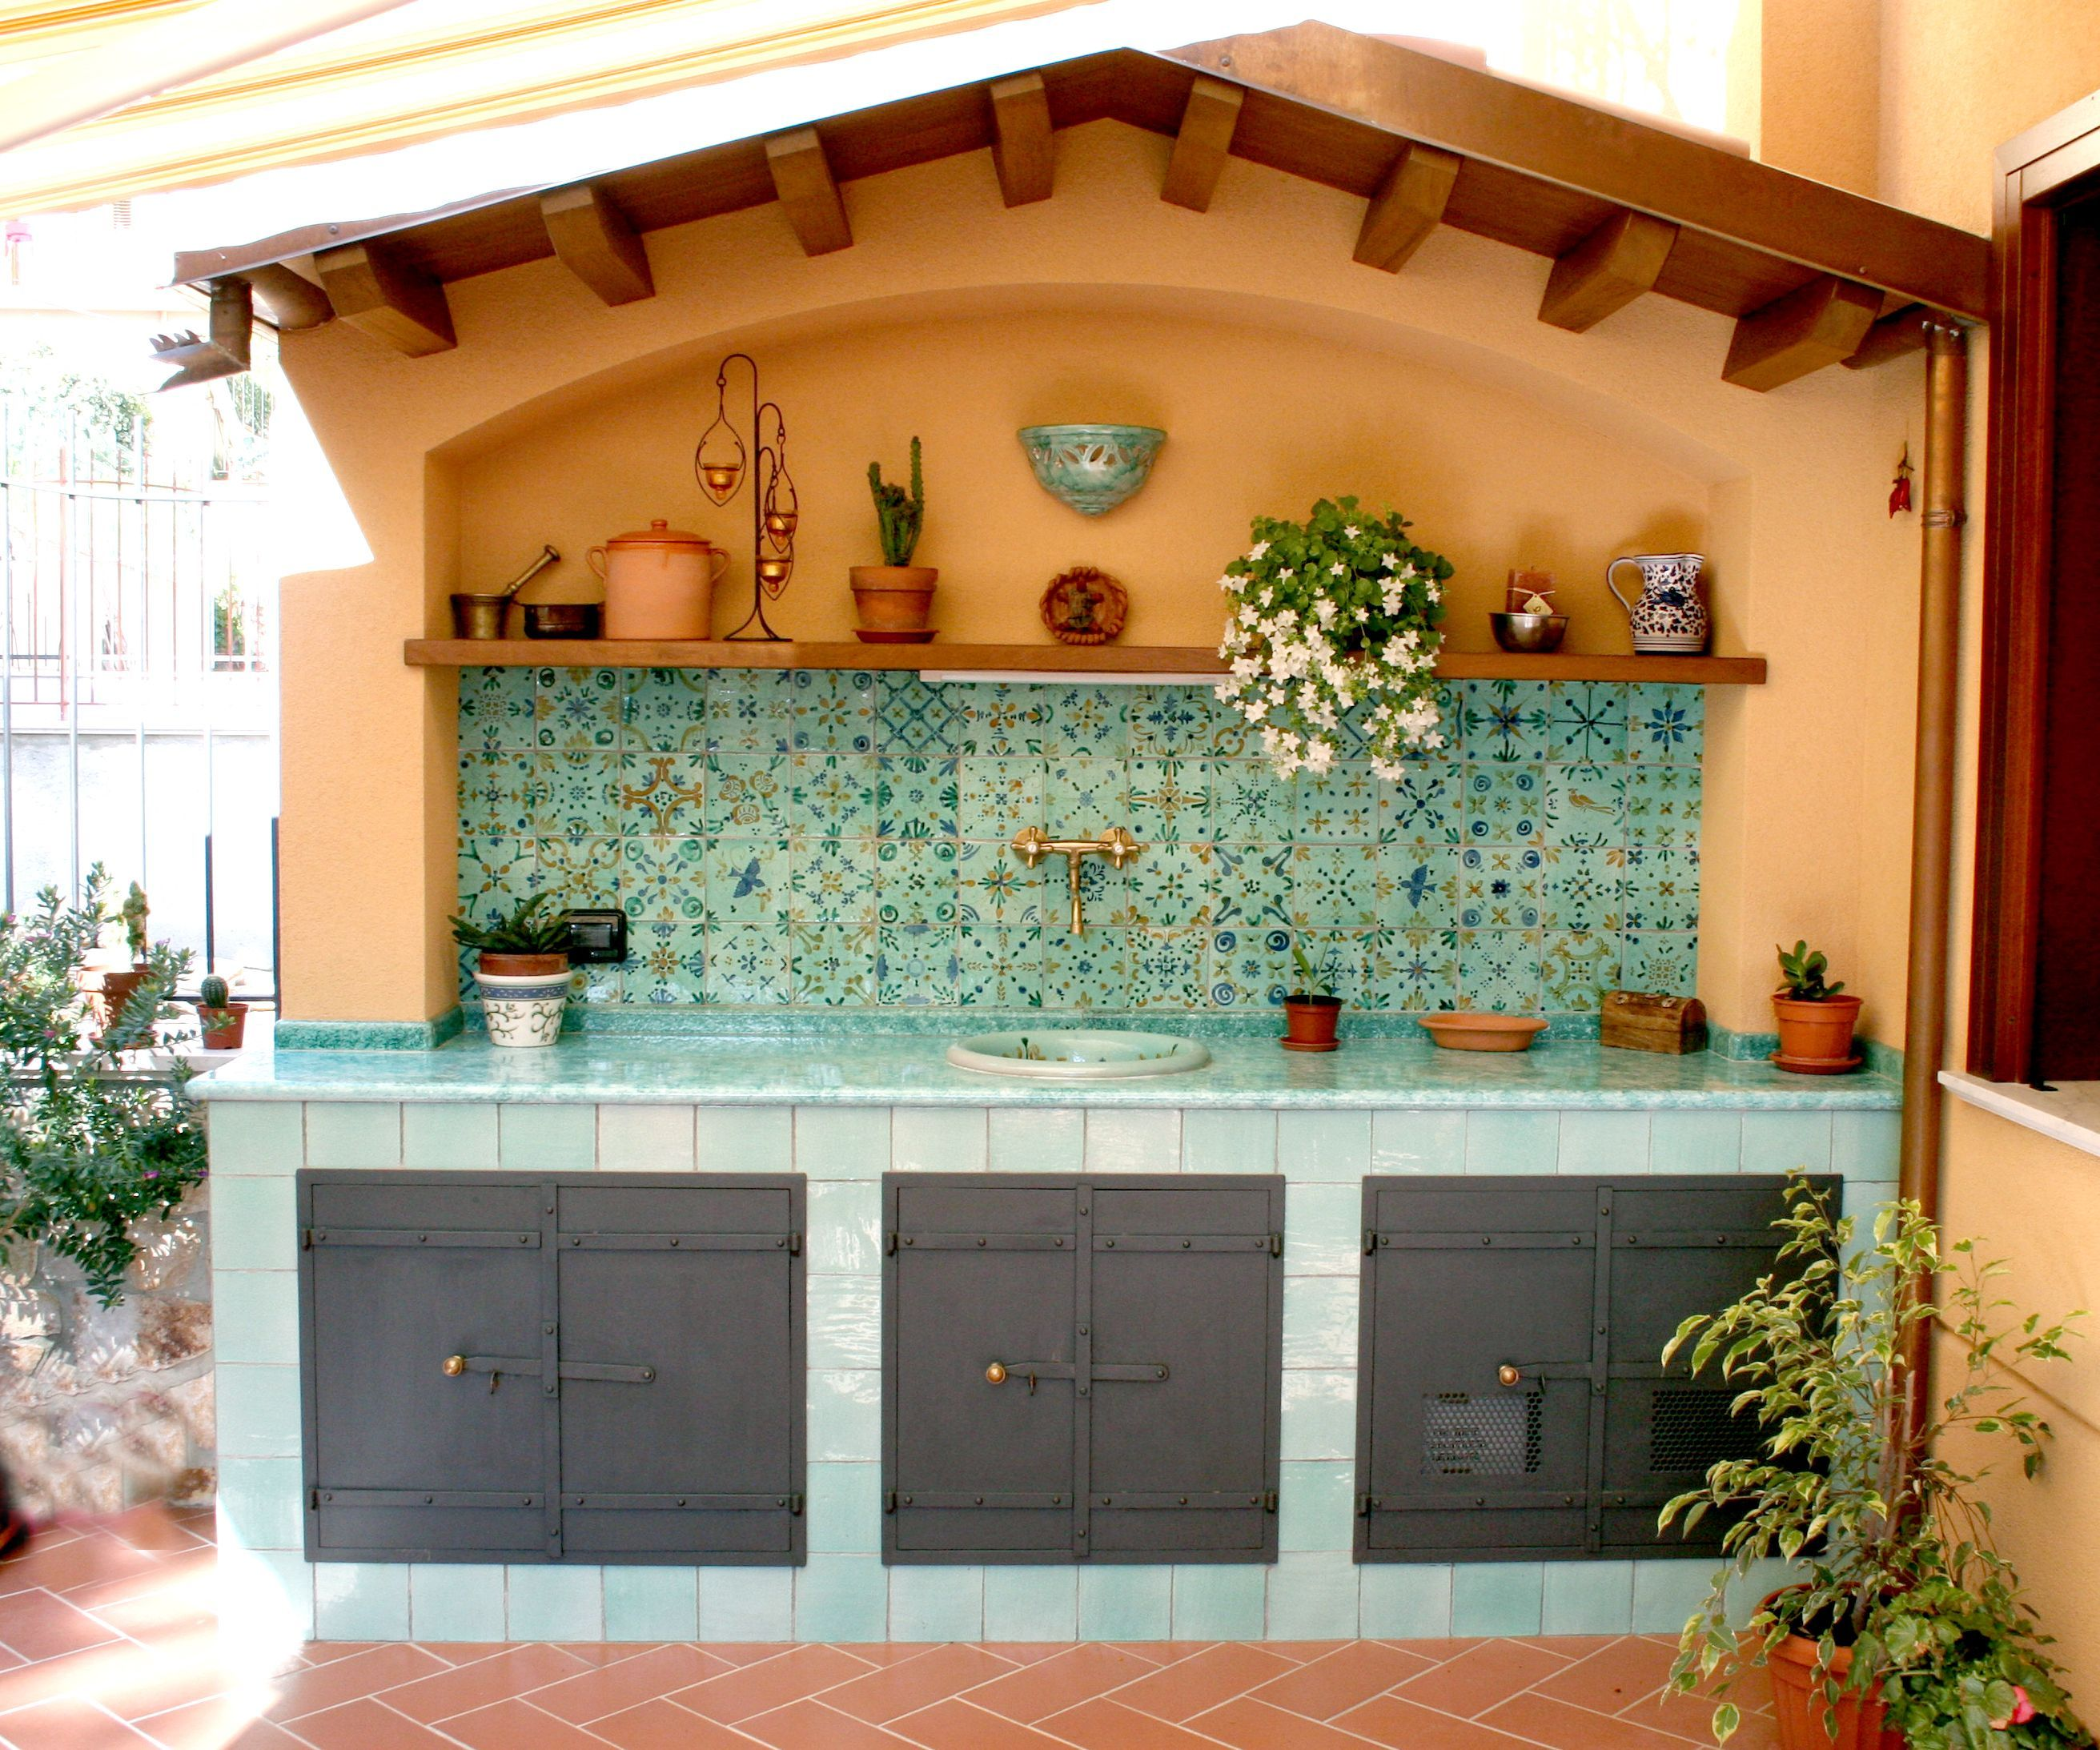 Vi piacerebbe avere una cucina del genere in giardino? 19 1 Elkepeszto Szabadteri Konyha Diy Outdoor Kitchen Interior Design Kitchen Patio Kitchen